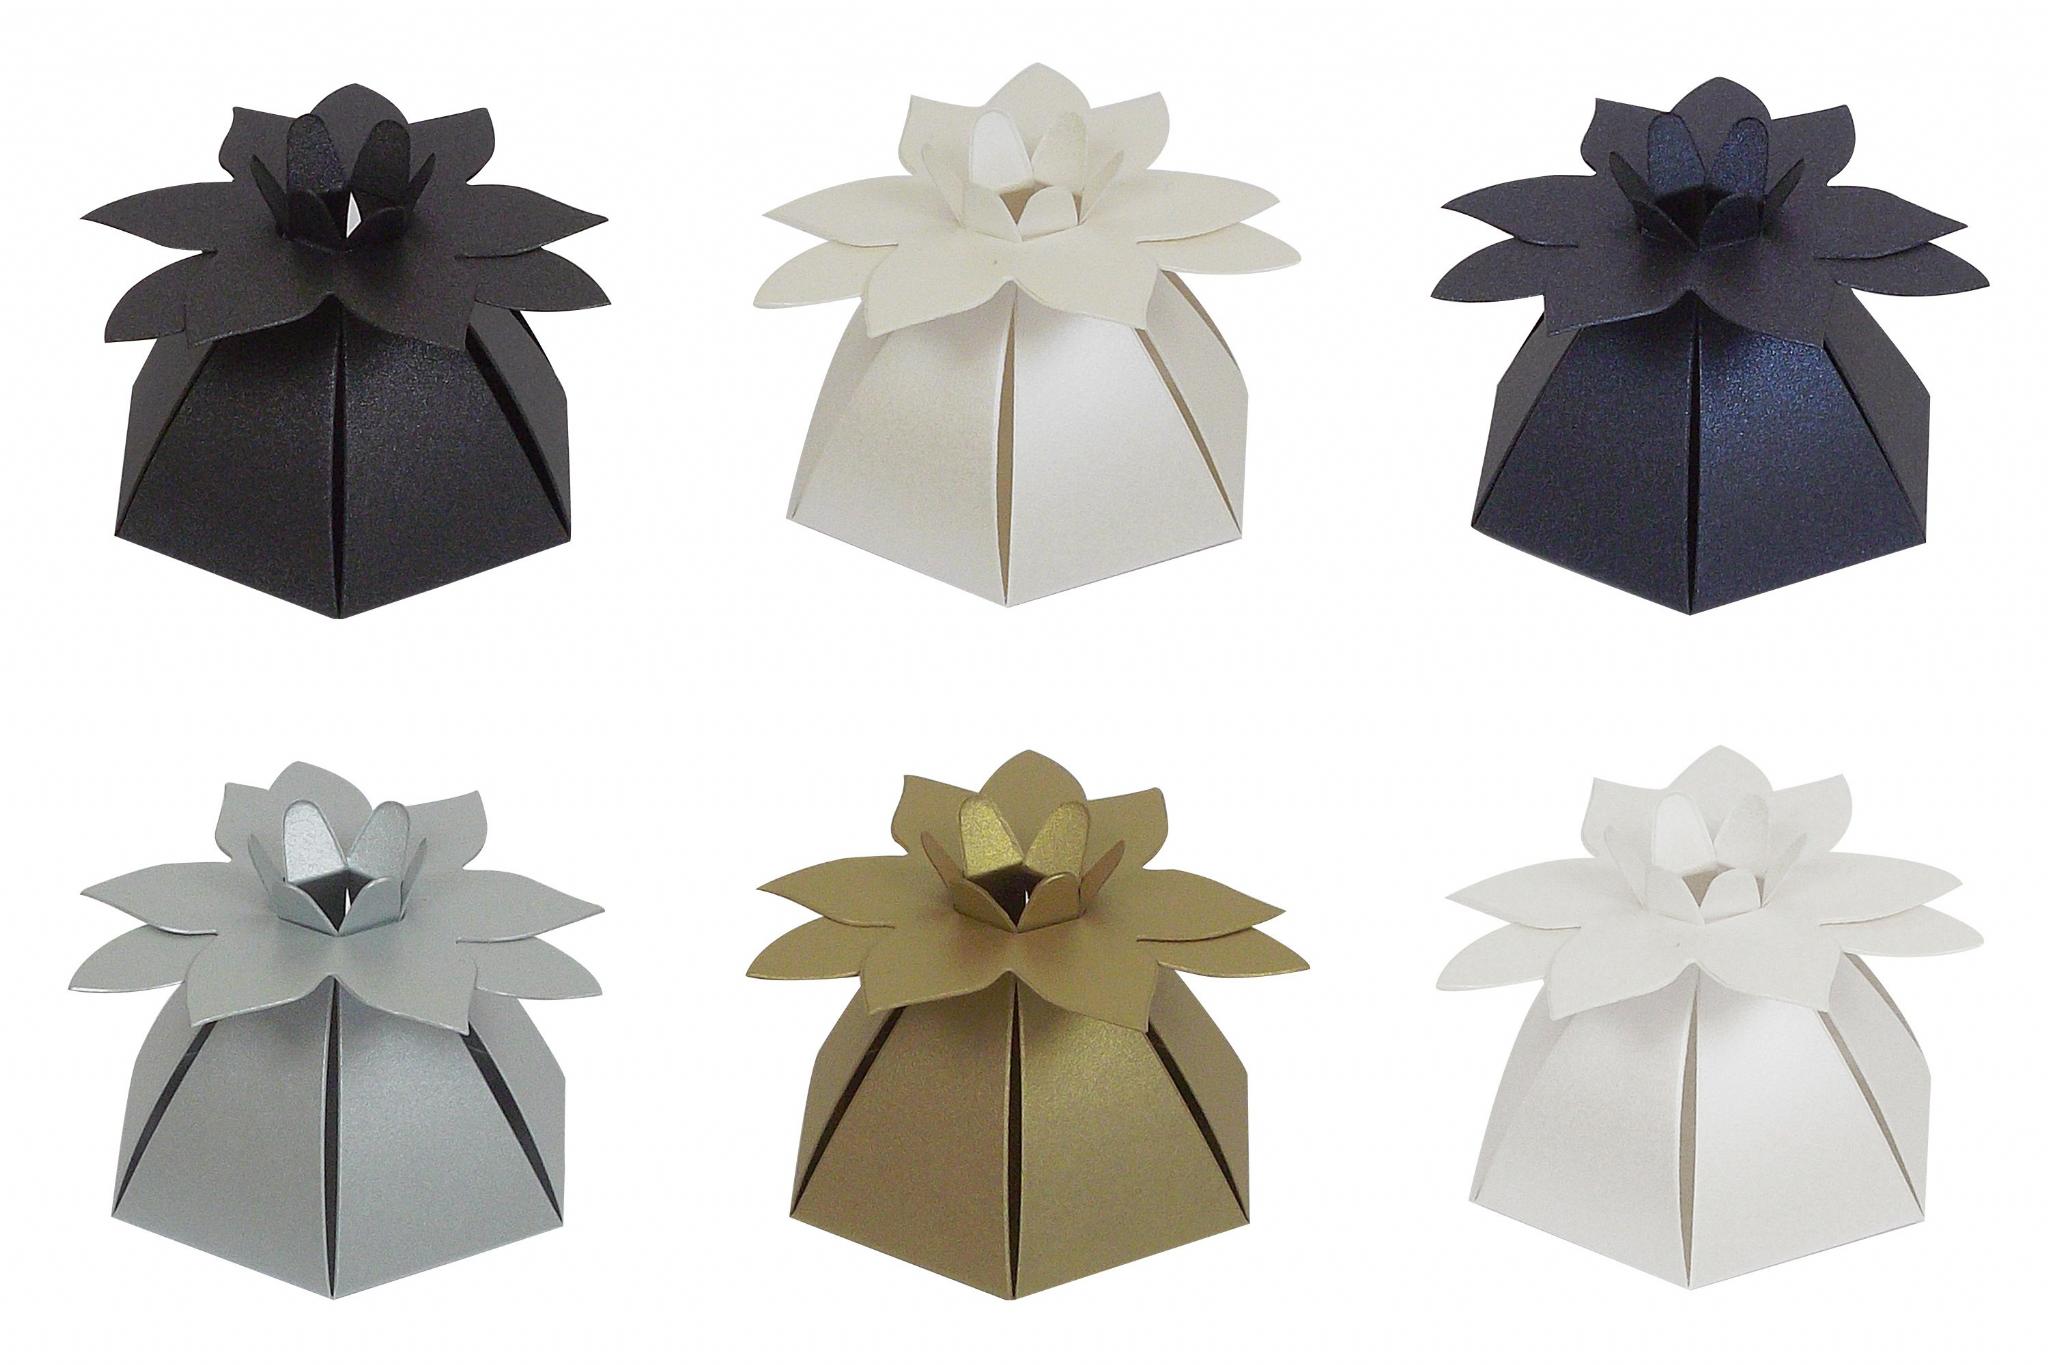 Pearlescent Flower Top Wedding Party Favour Boxes - Choose Colour ...